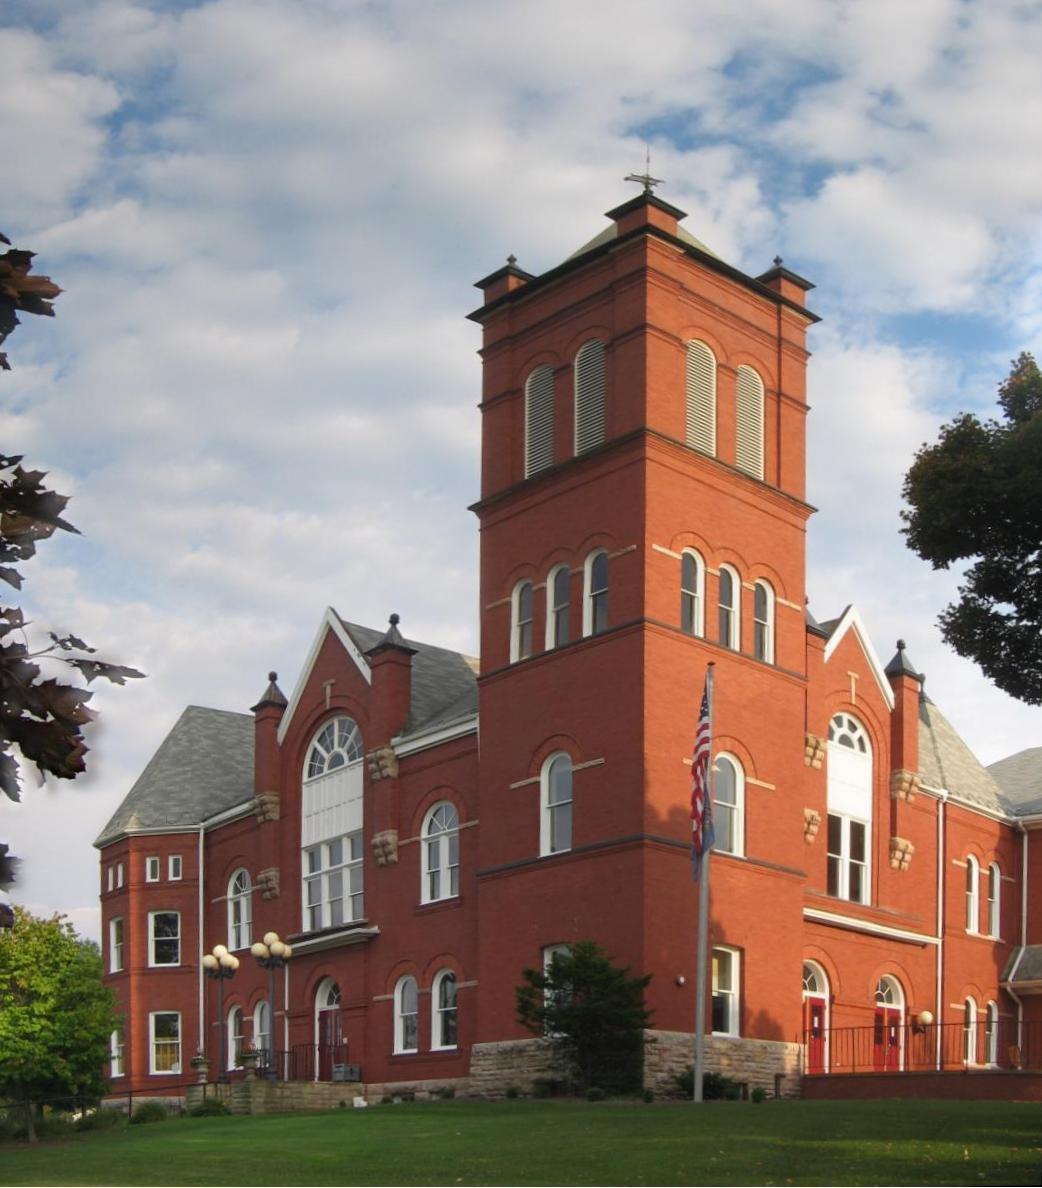 Sullivan county pennsylvania wikipedia for Laporte indiana courthouse